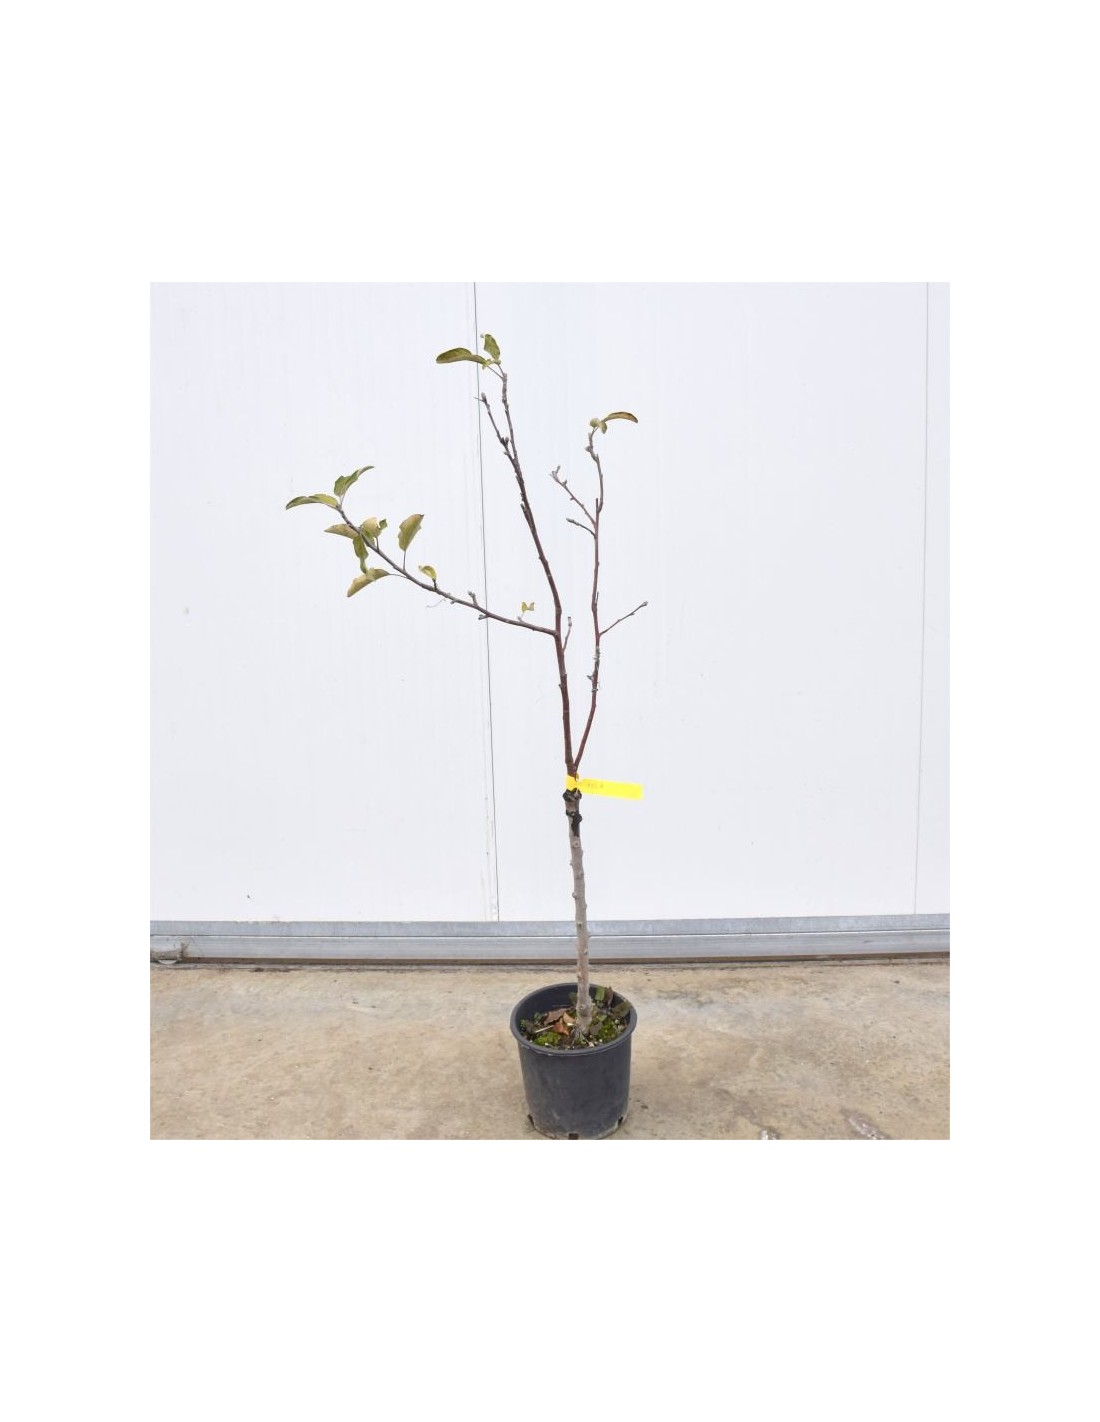 Foto Di Alberi Da Frutto vendita mix di alberi da frutto-alberi da frutto online|mondo piante